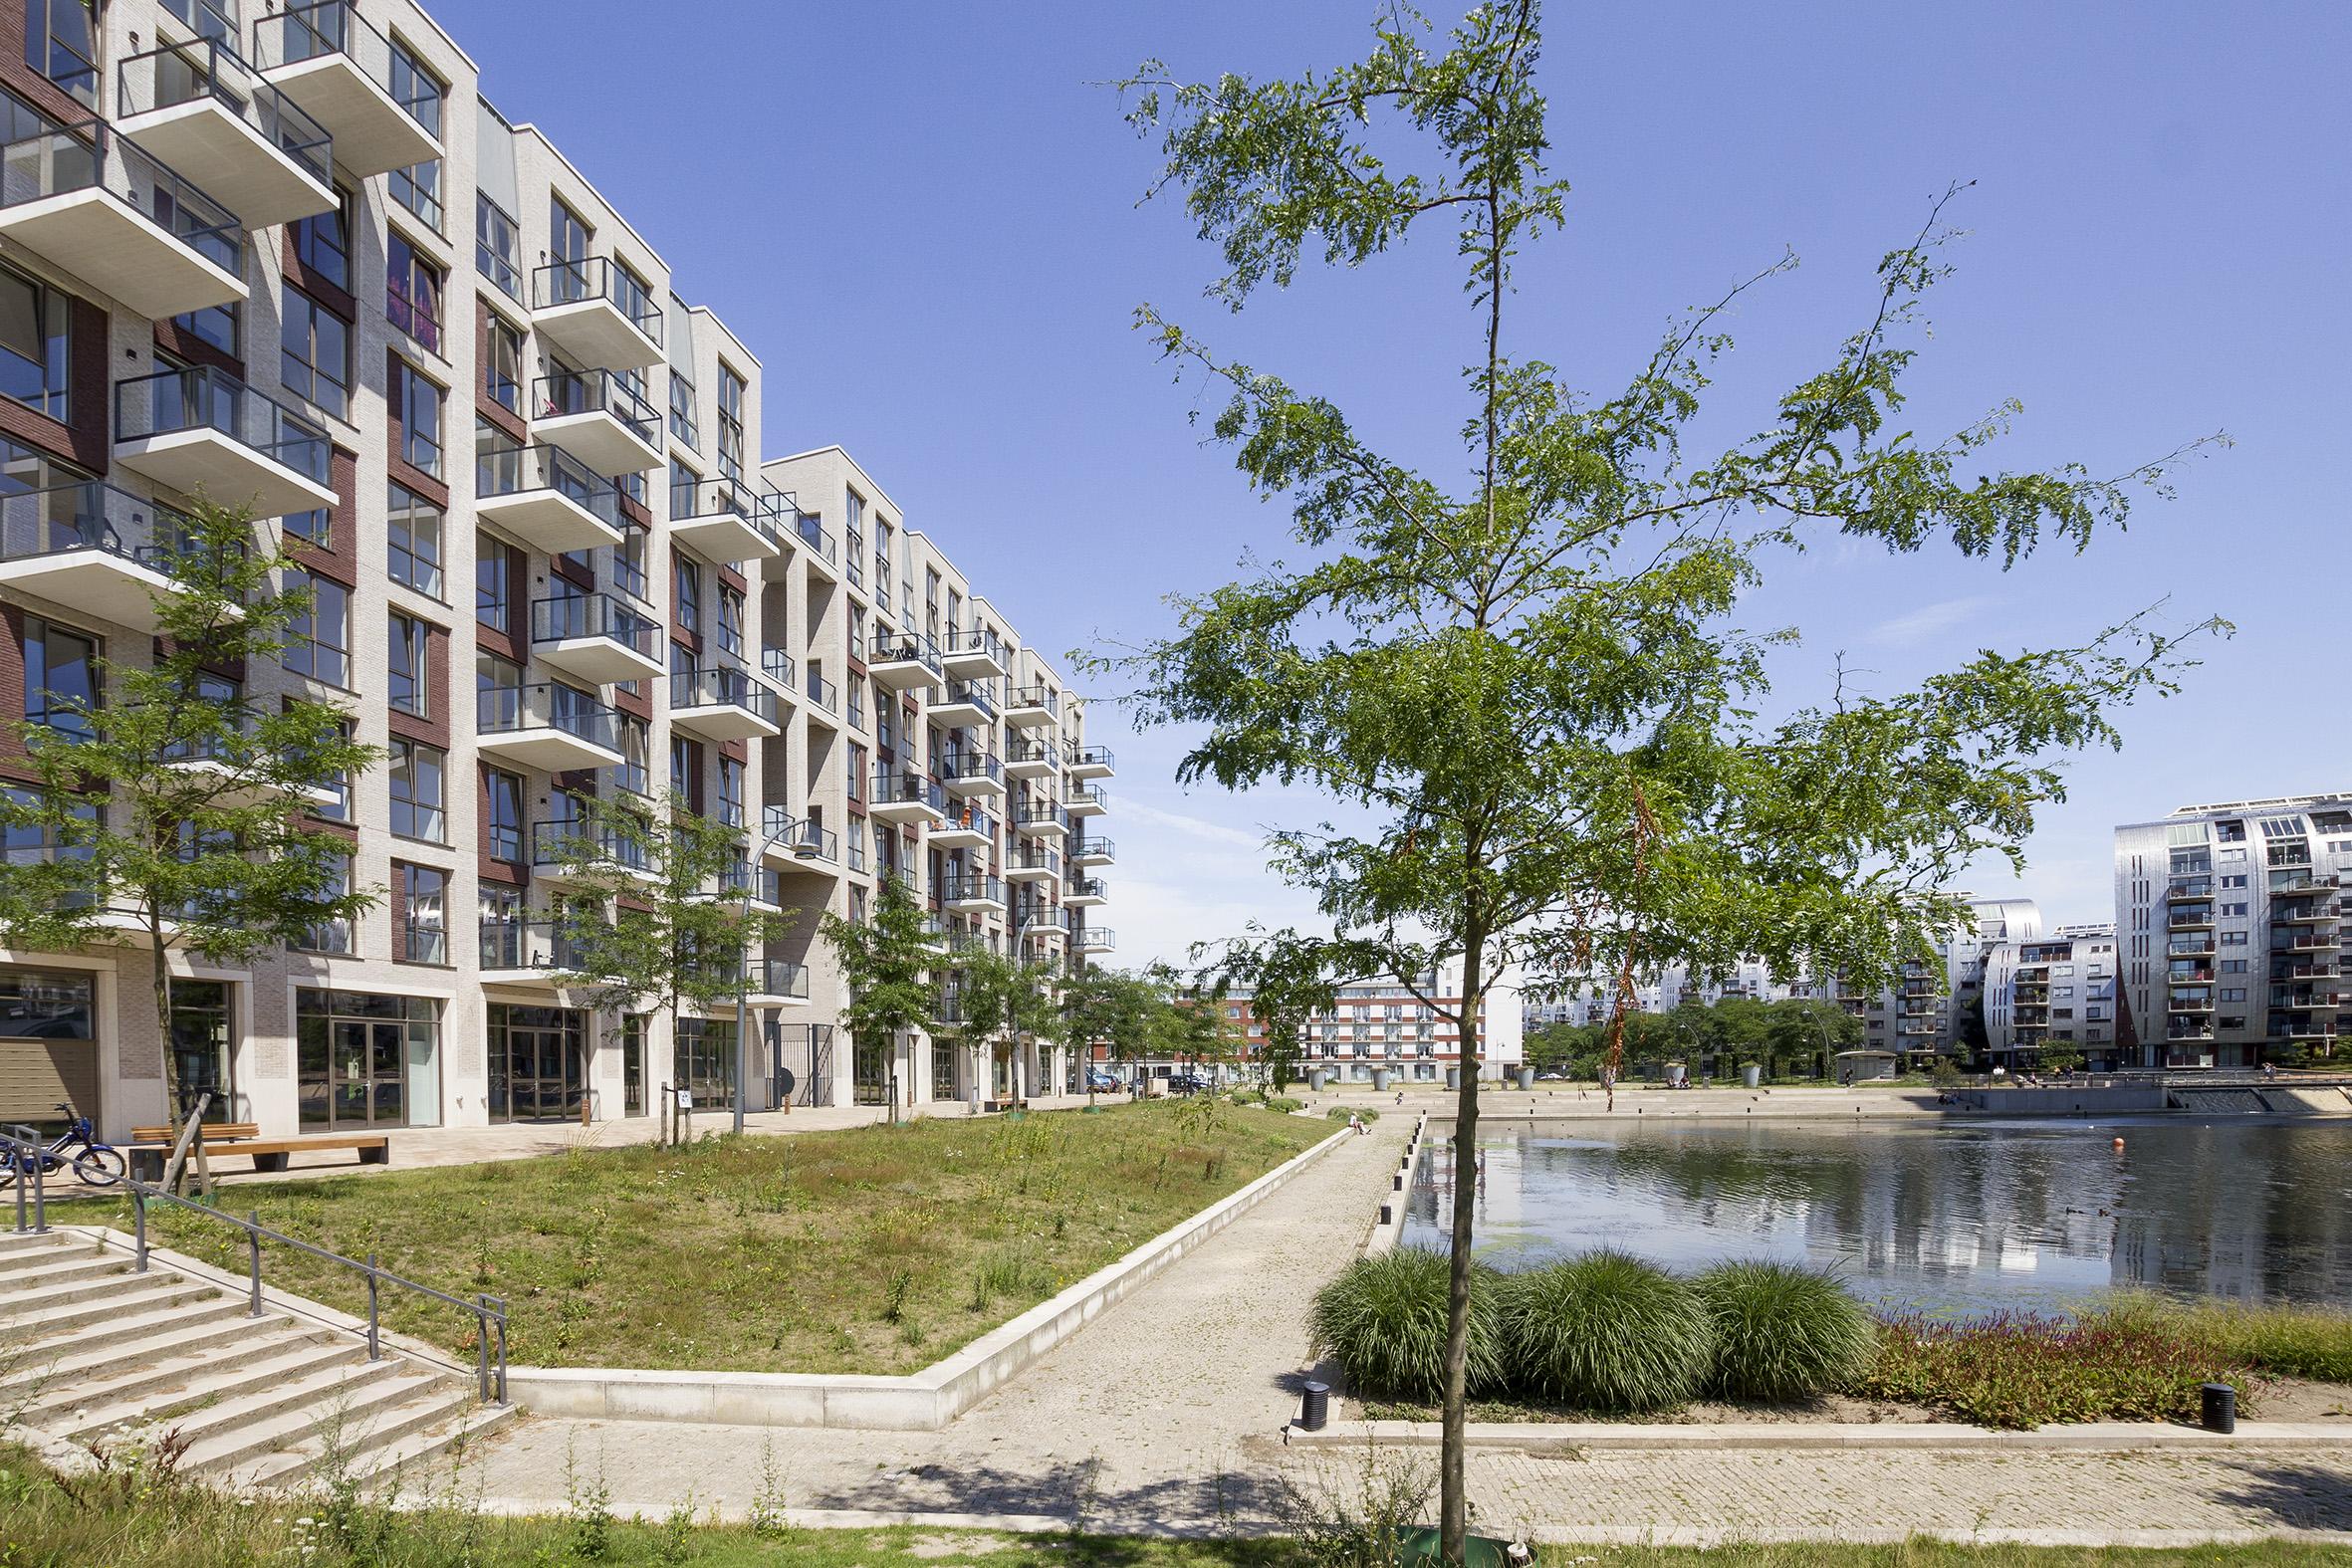 <p>foto: LEVS architecten</p>